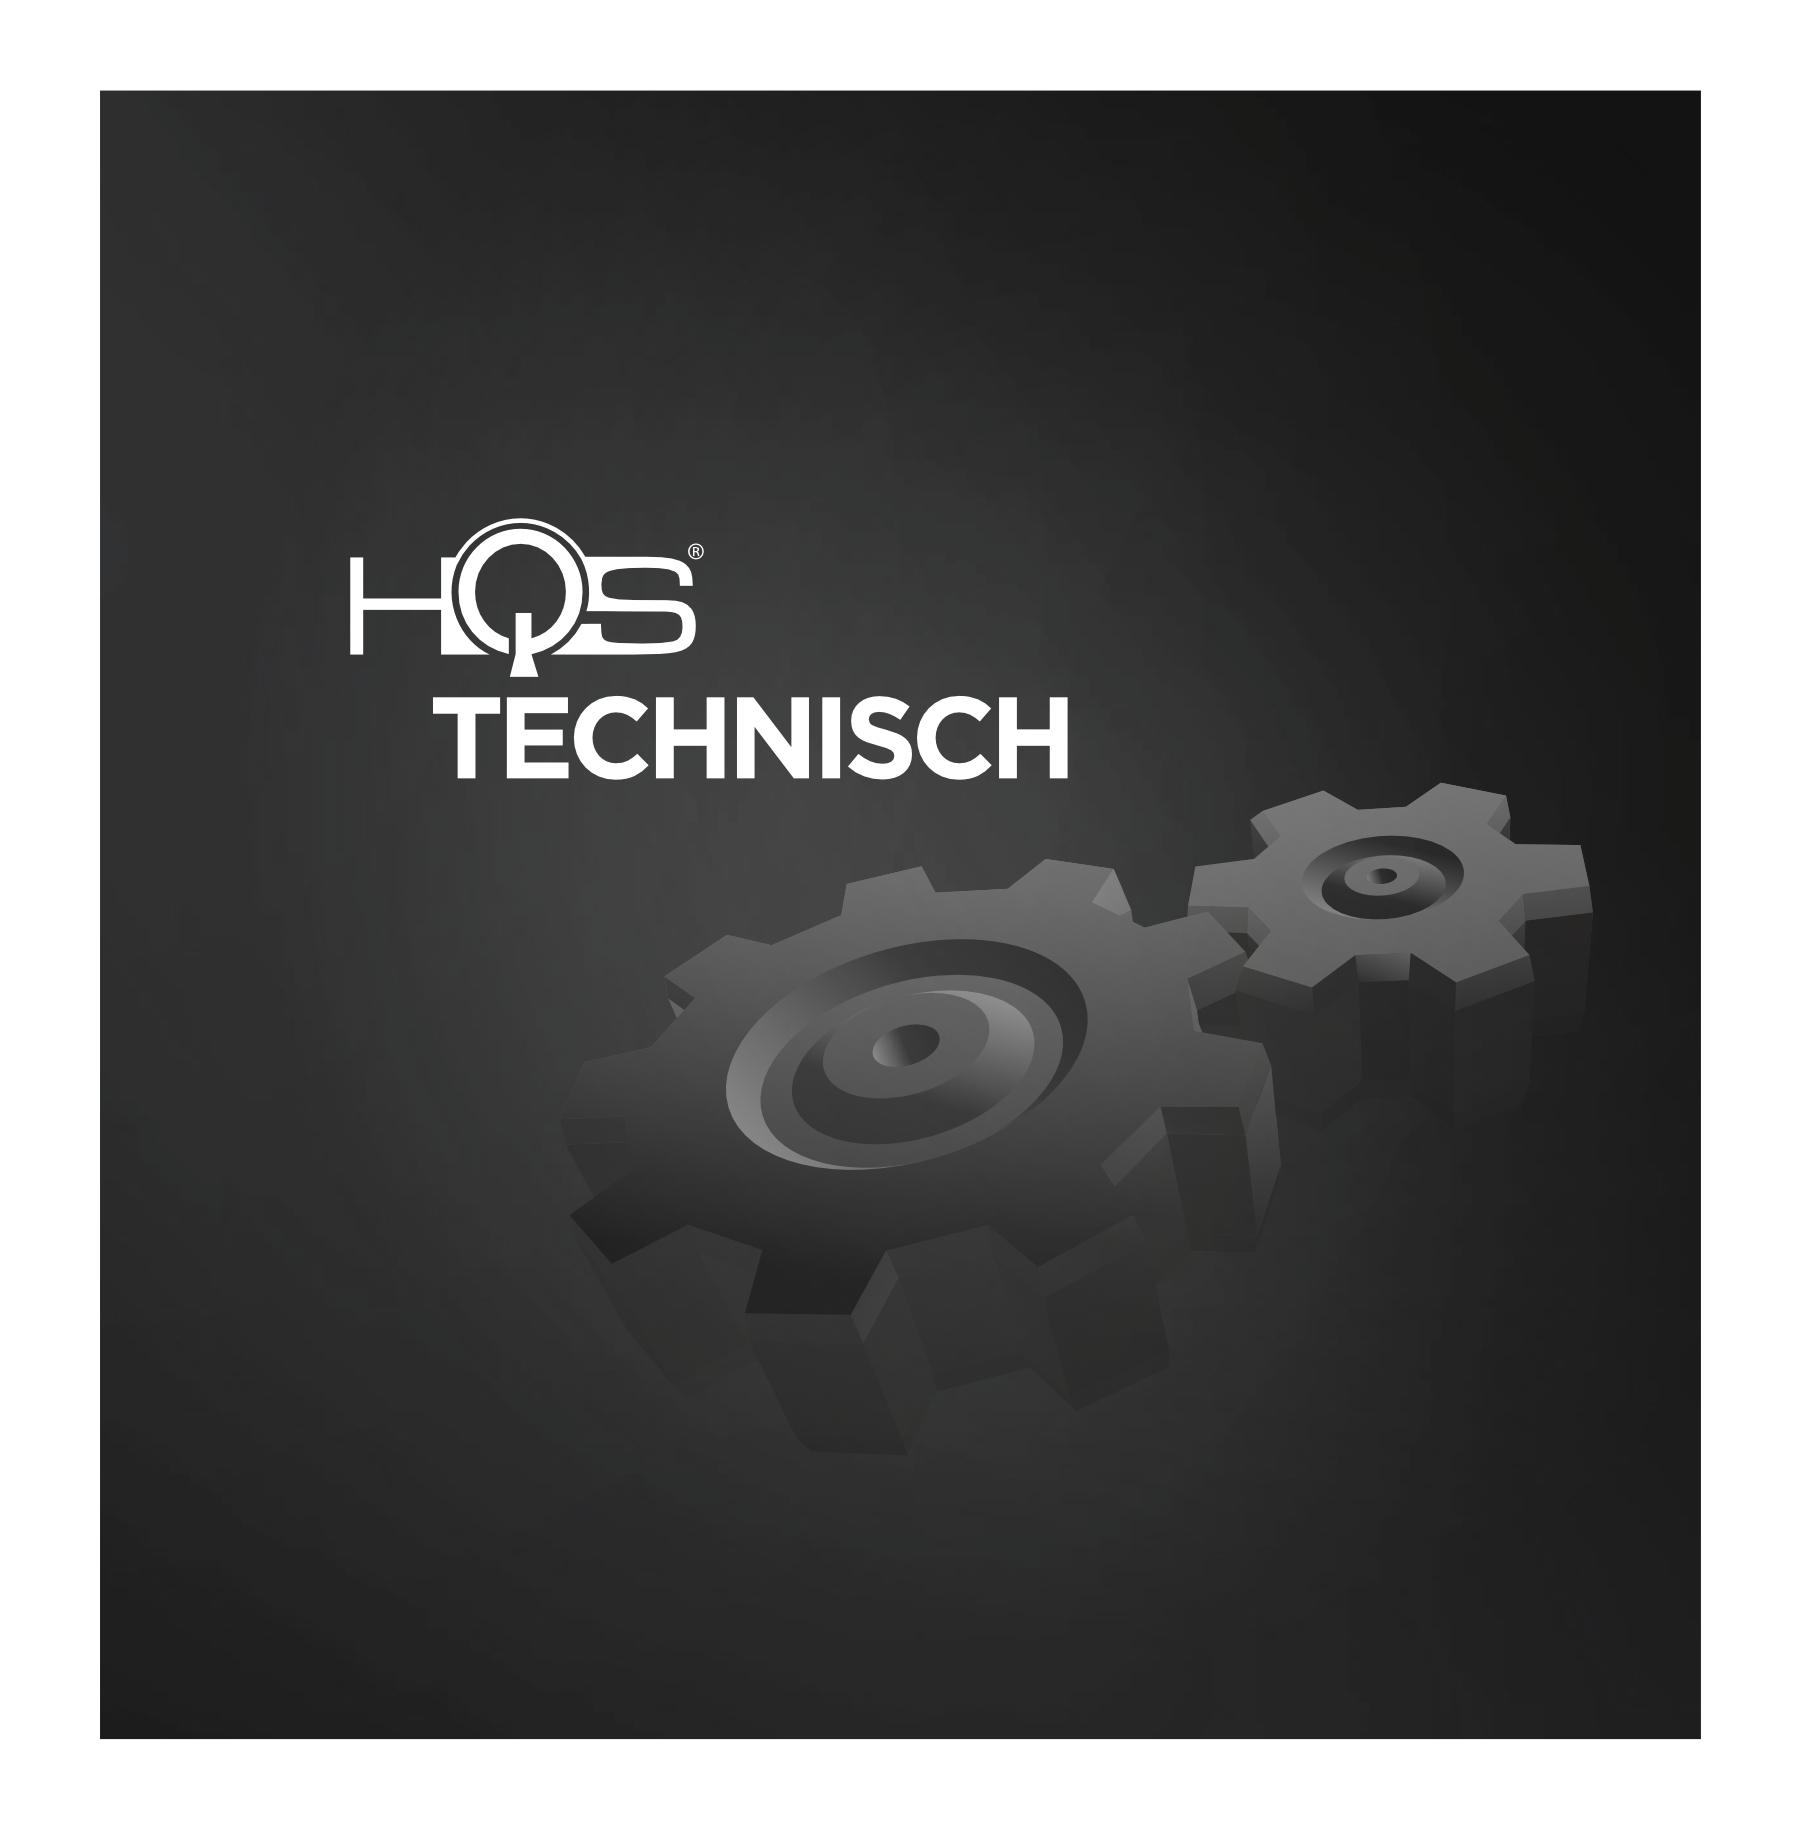 tenici_indice_heldis_web_de.jpg